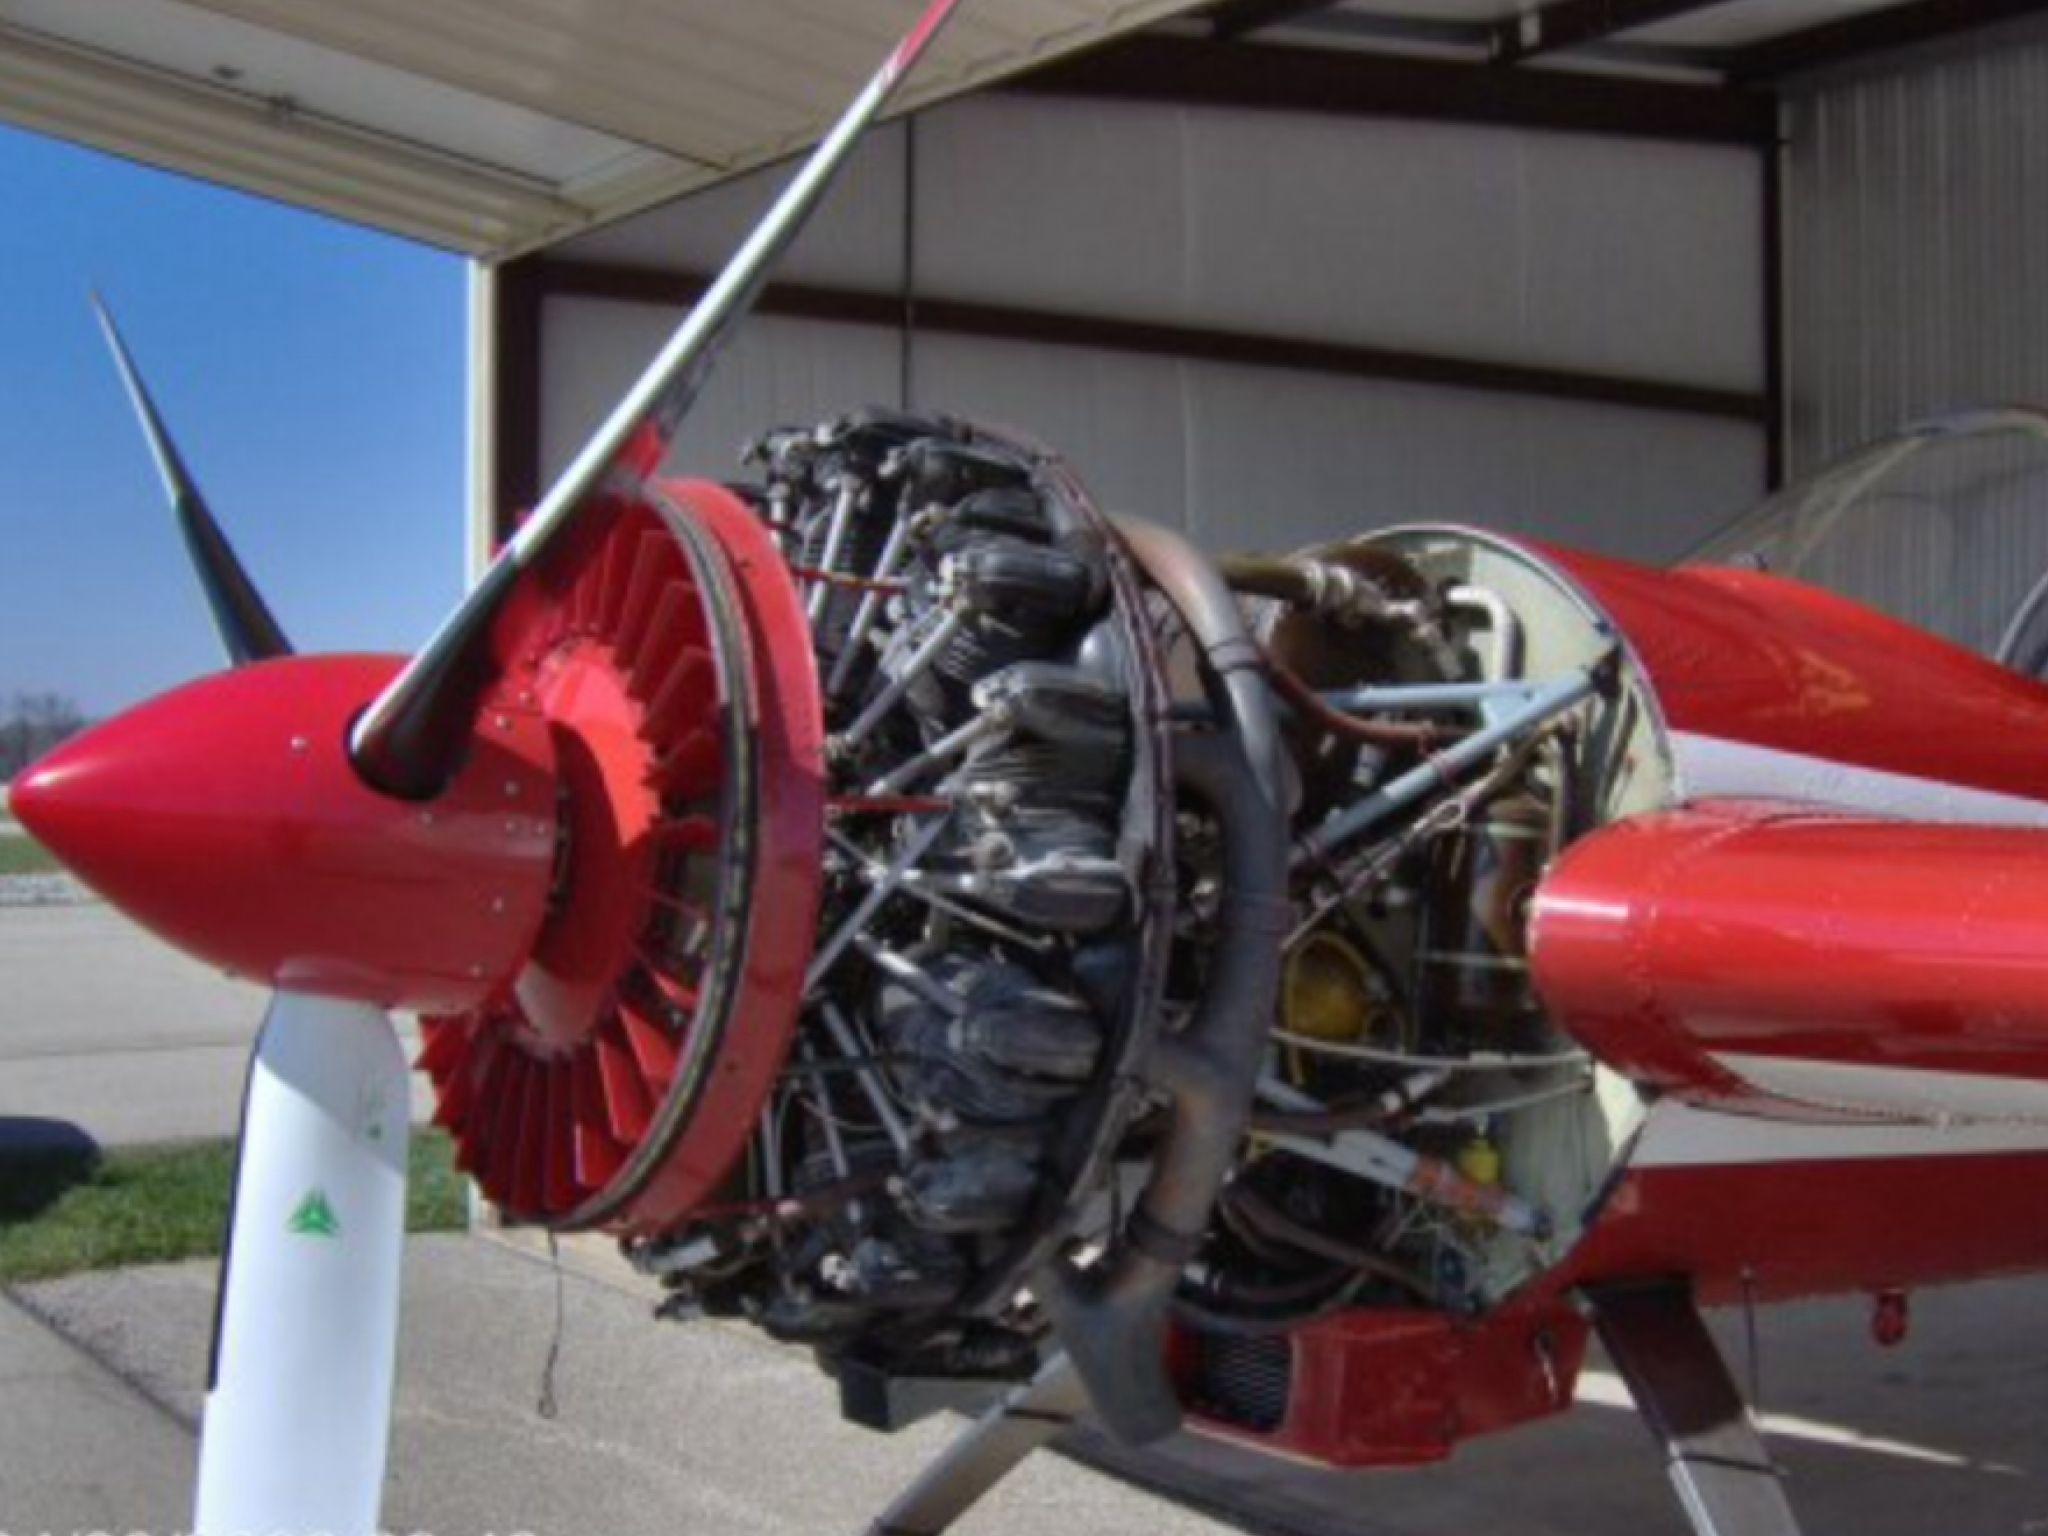 YAK 55 Aerobatic plane Yak